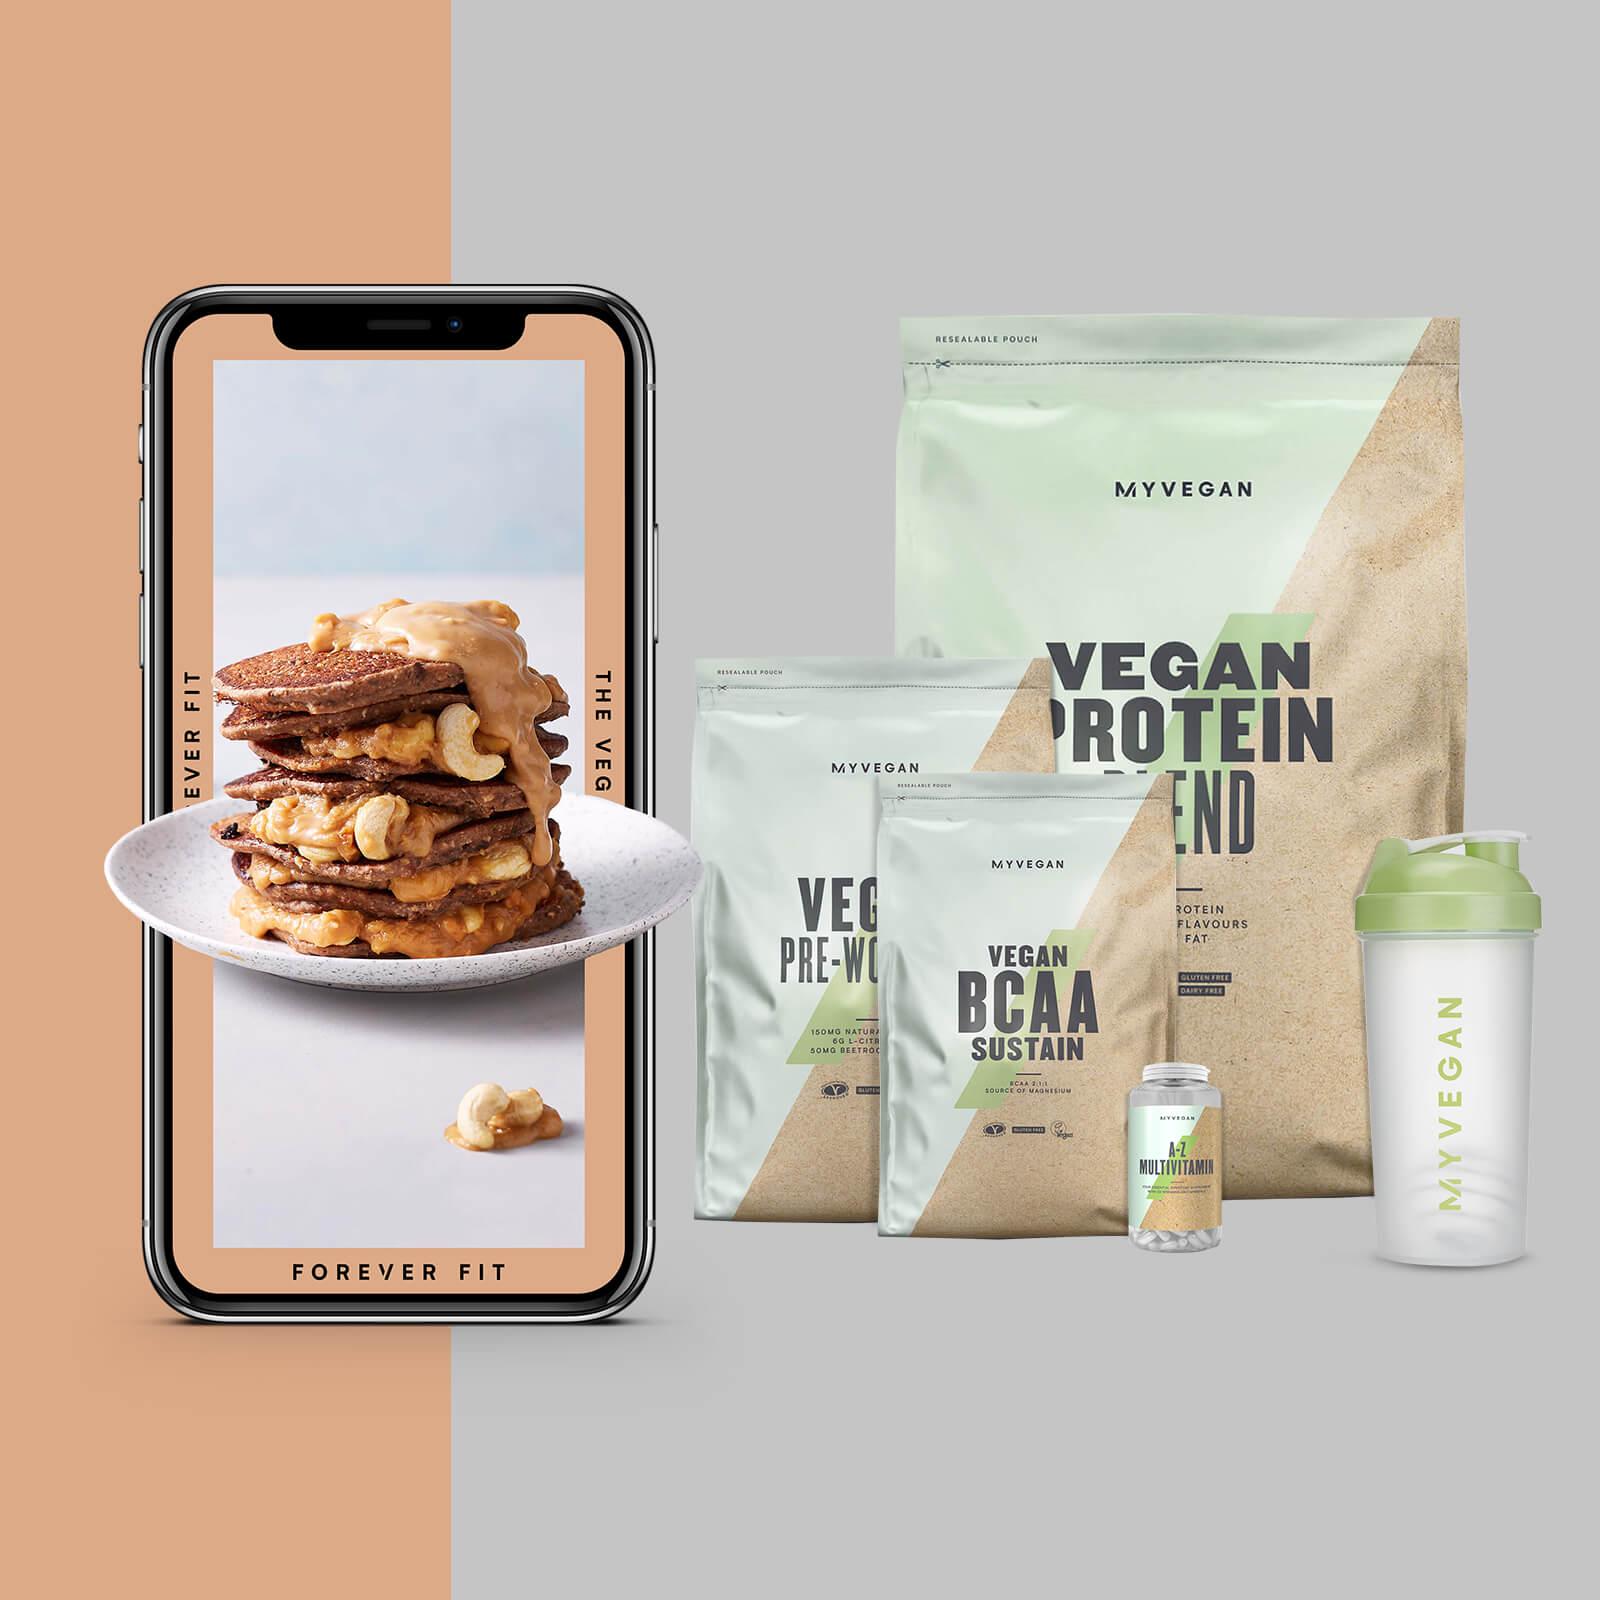 Le Pack Vegan + Guide Entraînement et Nutrition Offert - Lemon and Lime - Sour Apple - Coffee and Walnut